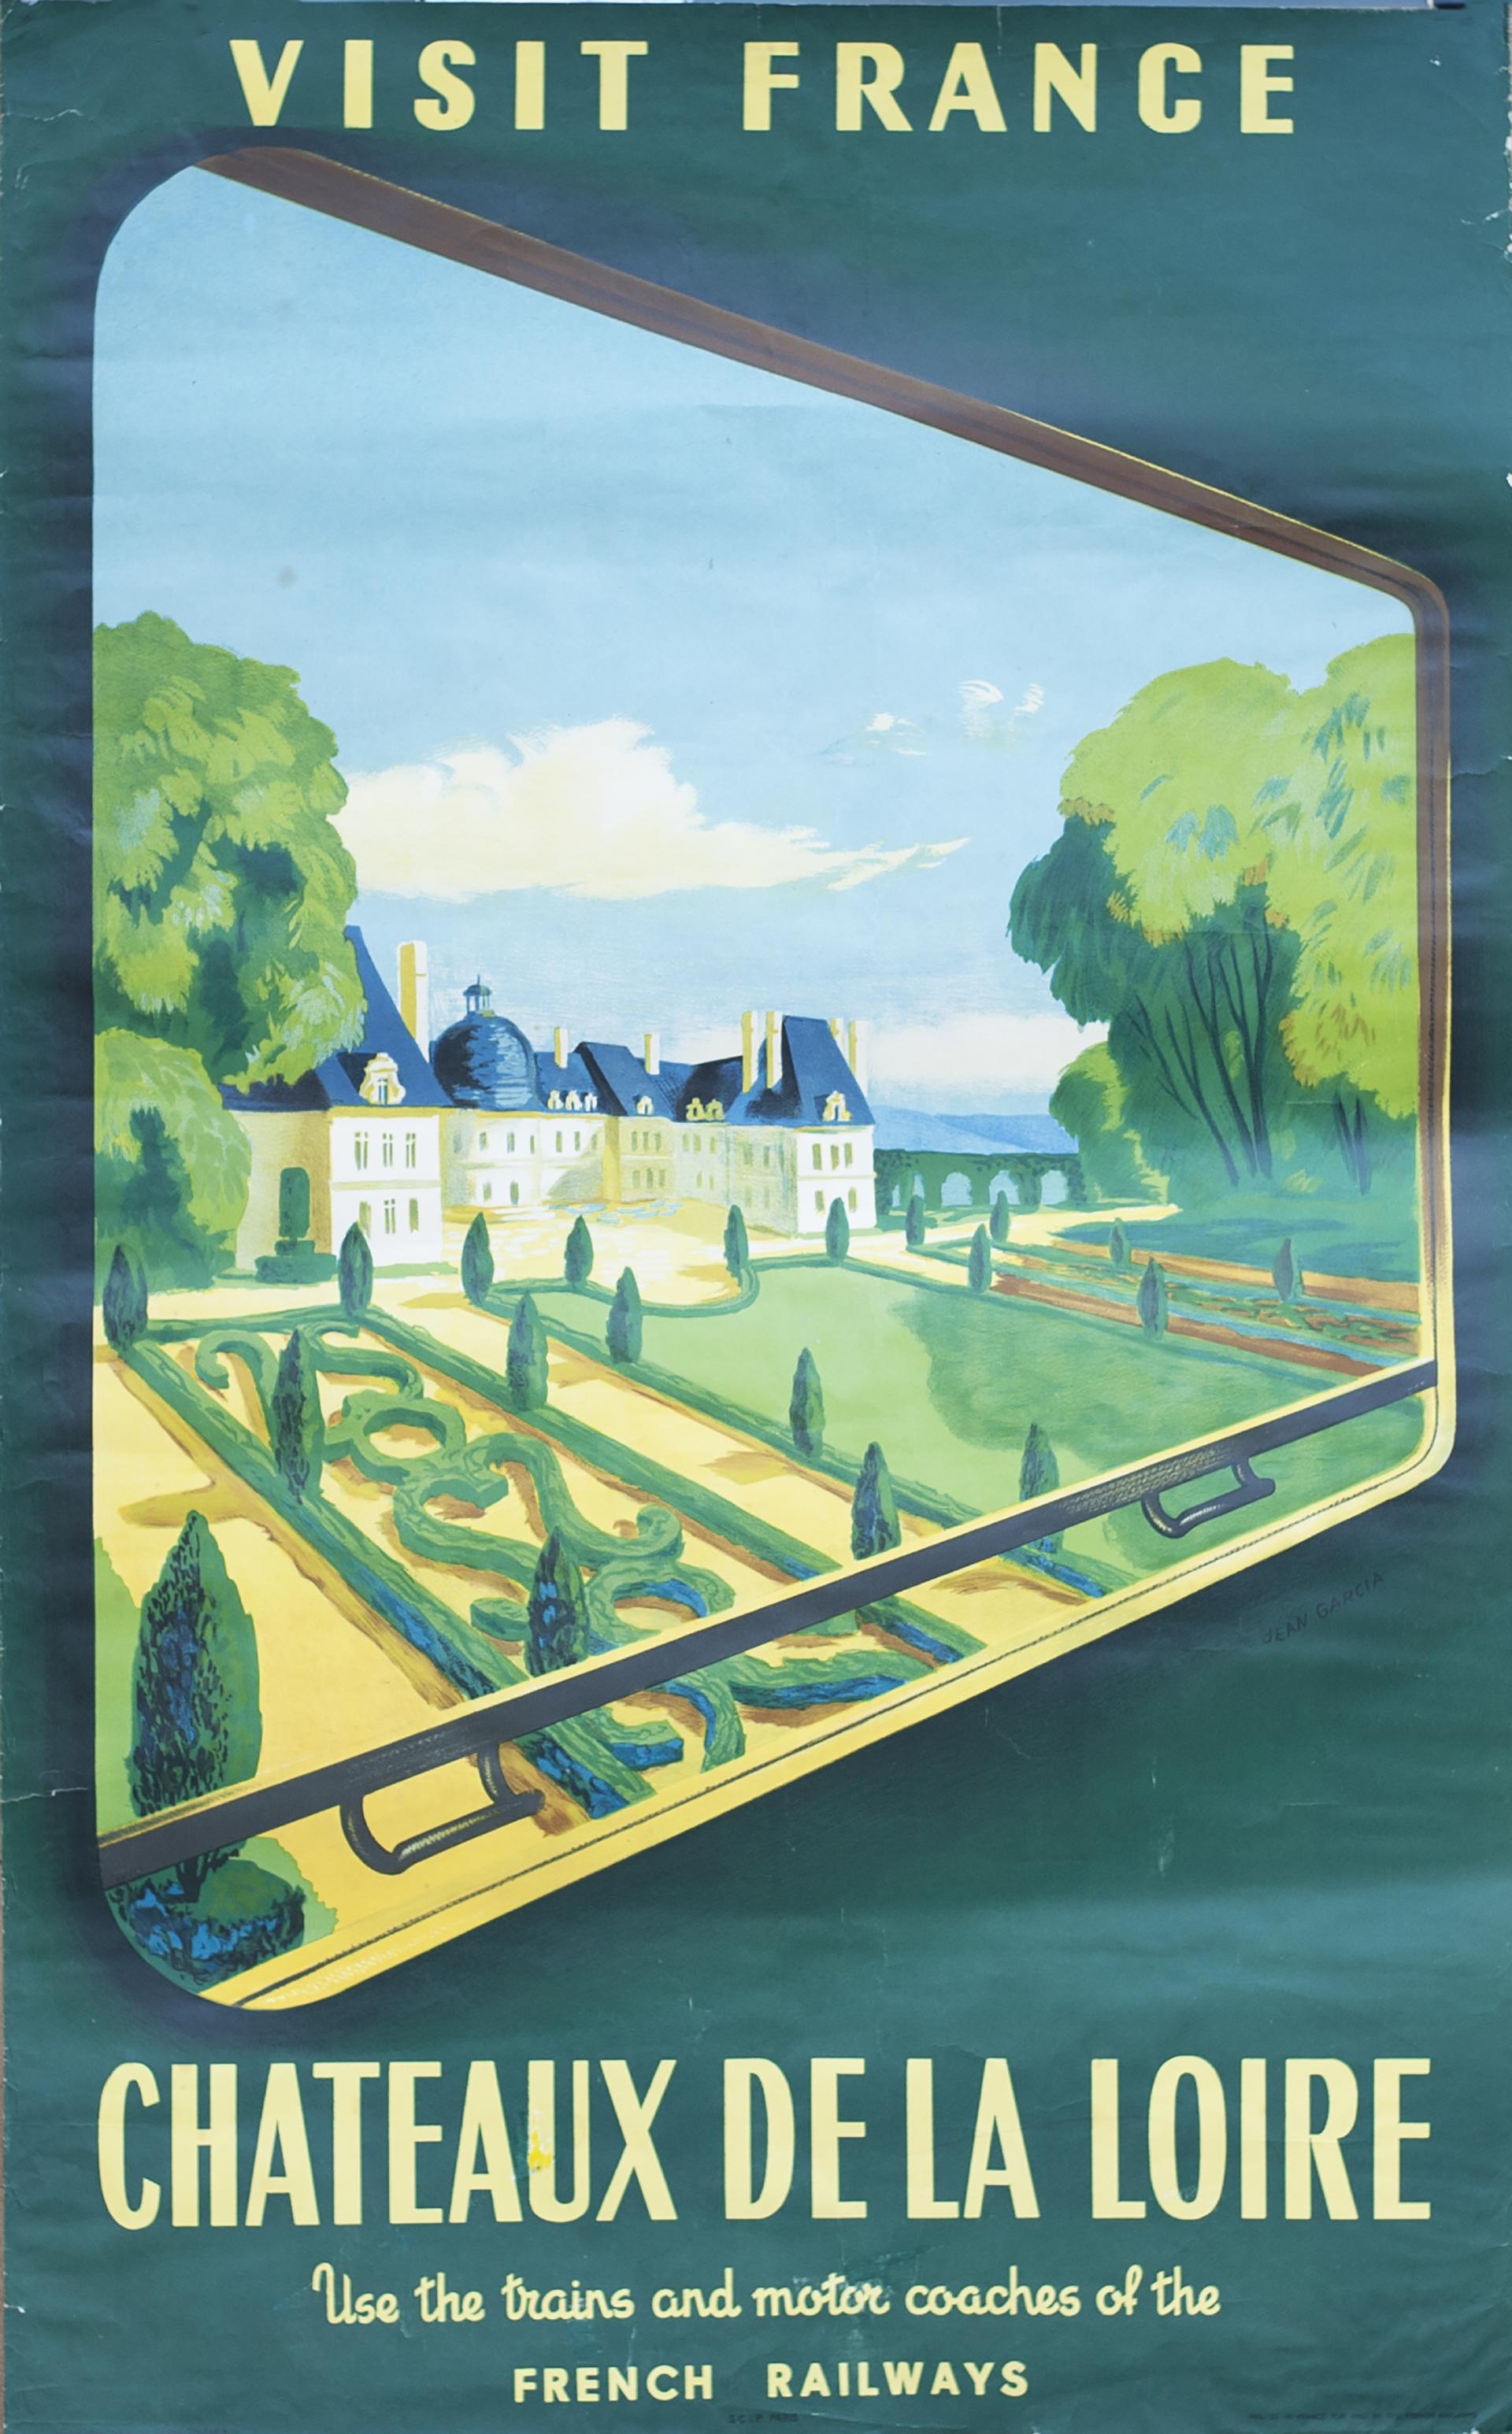 Poster SNCF VISIT FRANCE CHATEAUX DE LA LOIRE by Jean Garcia issued in 1952. Double Royal 25in x